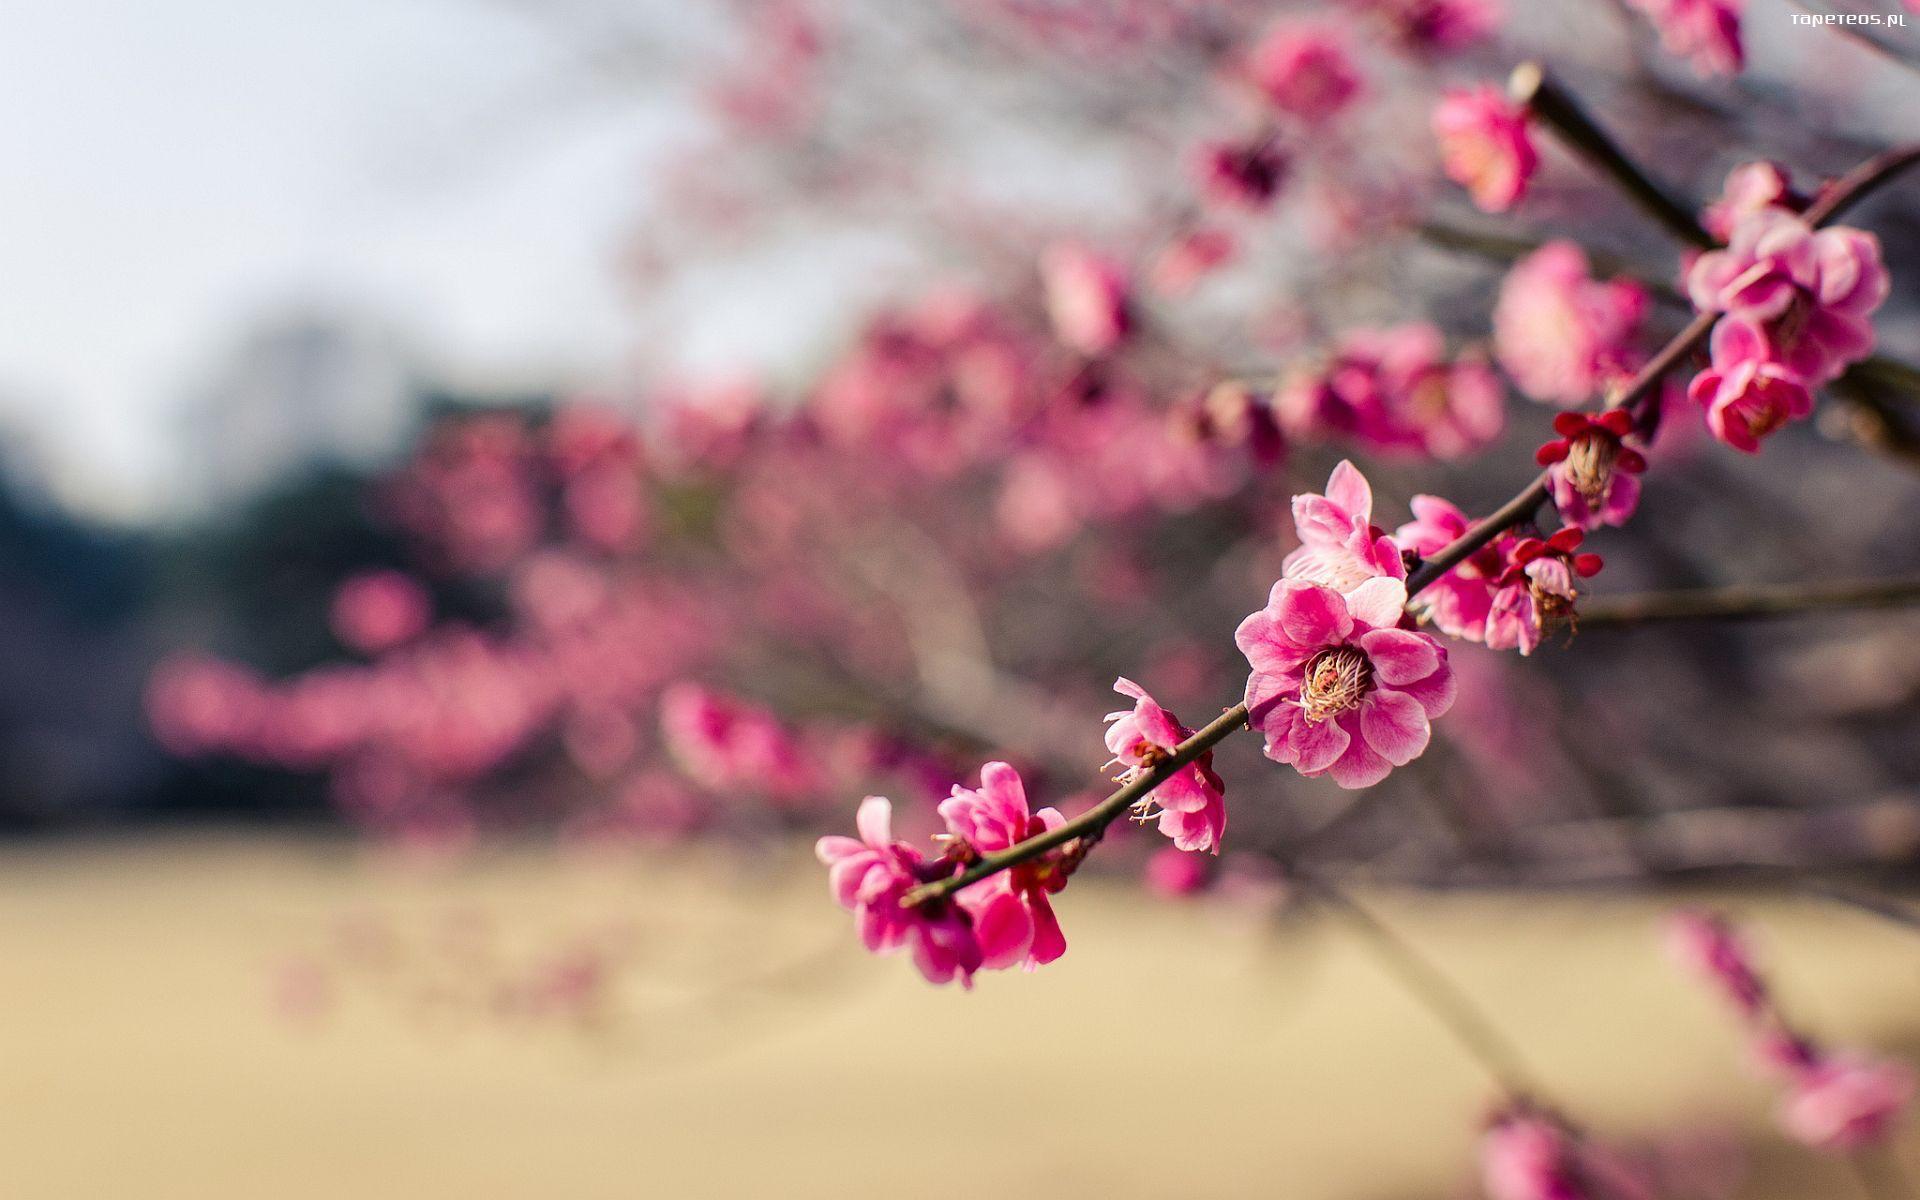 Tapety Na Pulpit Krajobrazy Kwiaty Szukaj W Google Hd Nature Wallpapers Cherry Blossom Japan Cherry Blossom